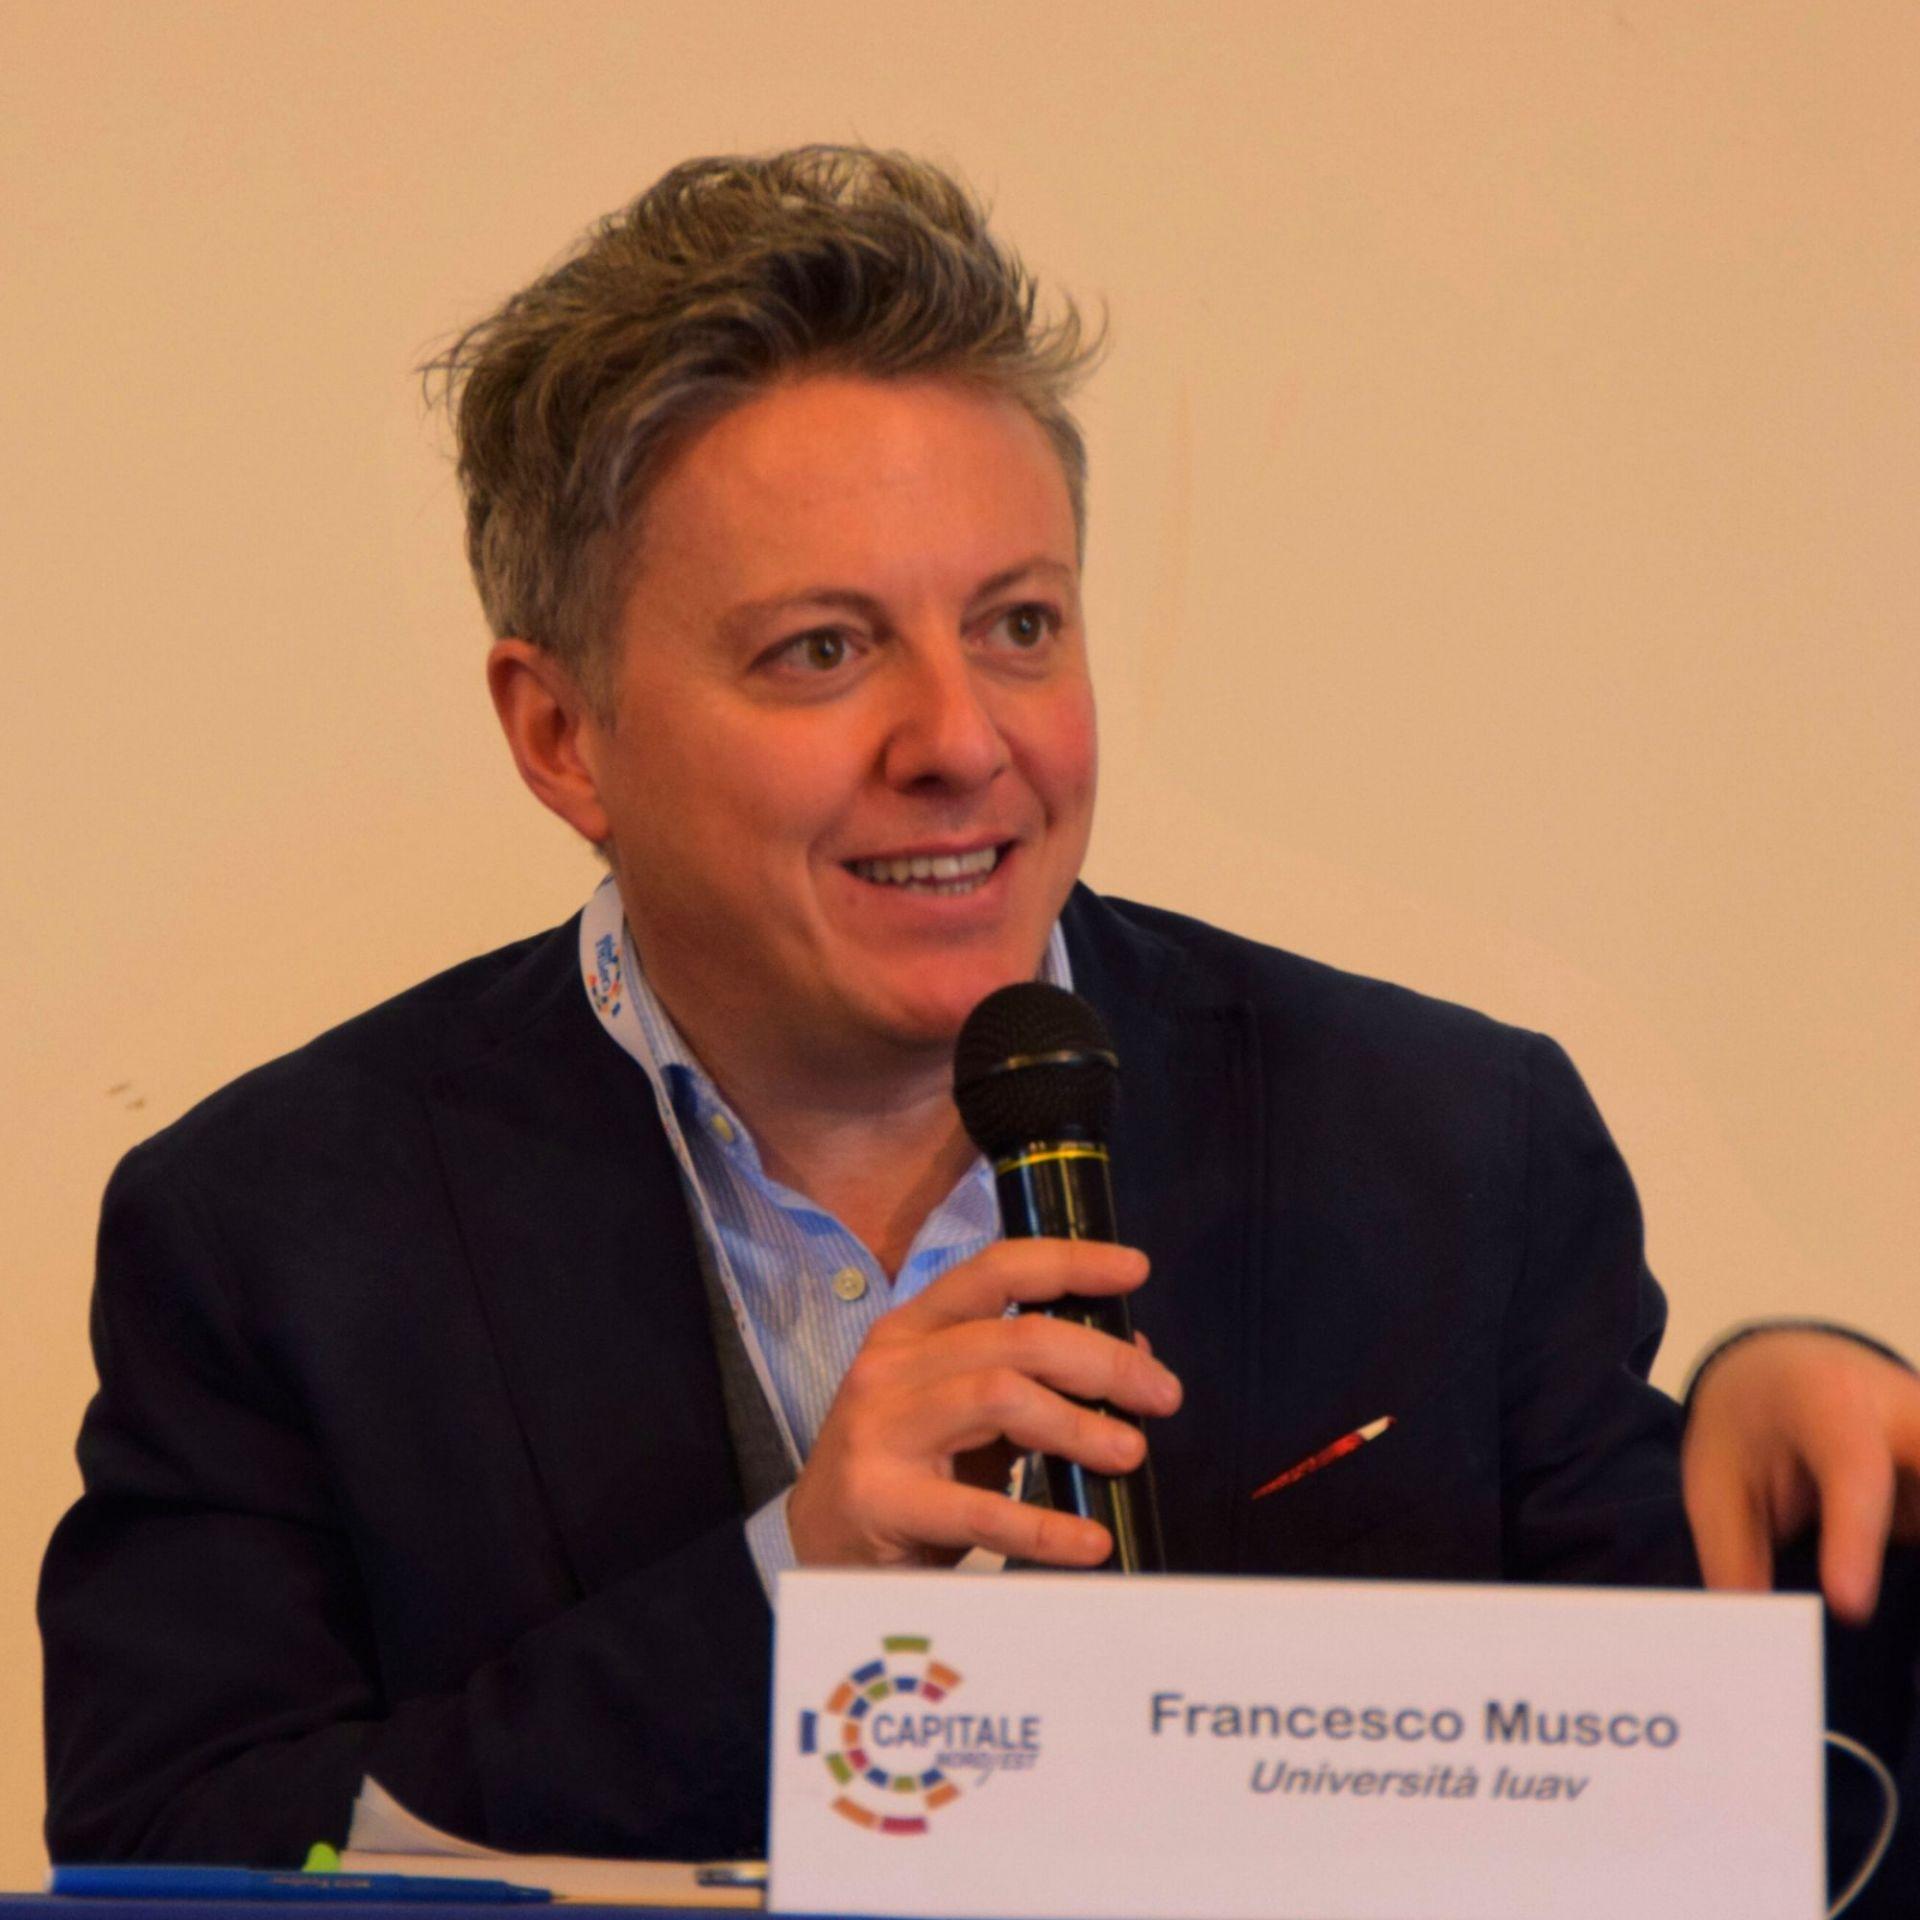 Francesco Musco